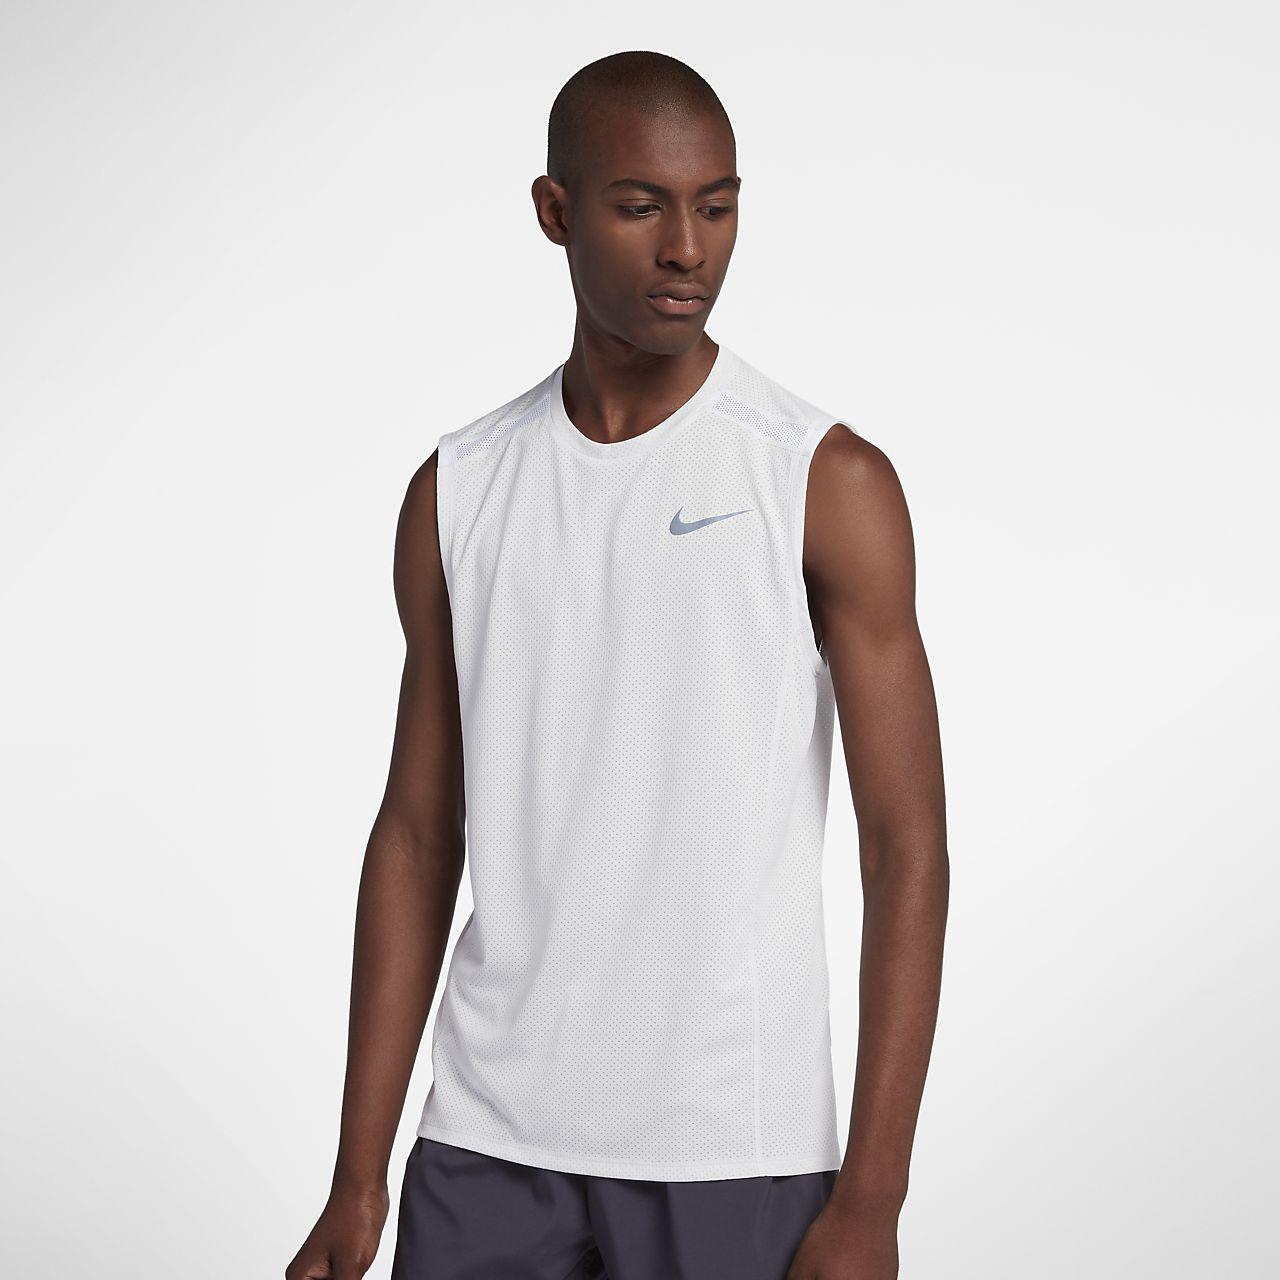 1a80acb889e4a Nike Miler Men s Sleeveless Running Top. Nike.com IL